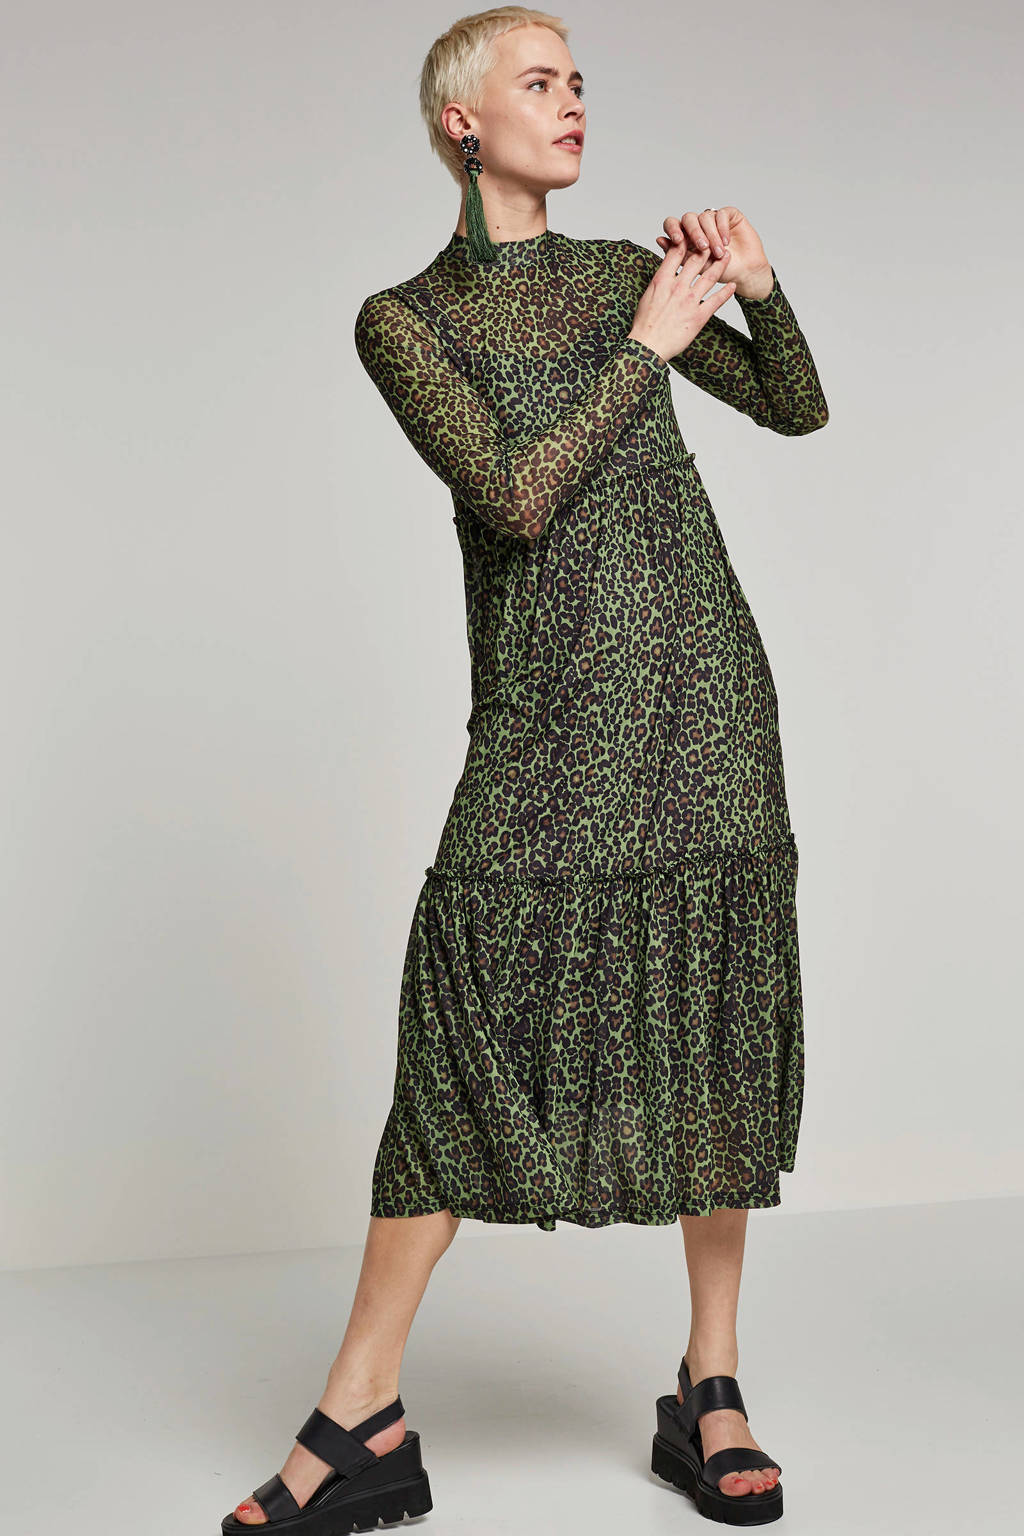 VILA mesh jurk met panterprint, Groen/bruin/zwart